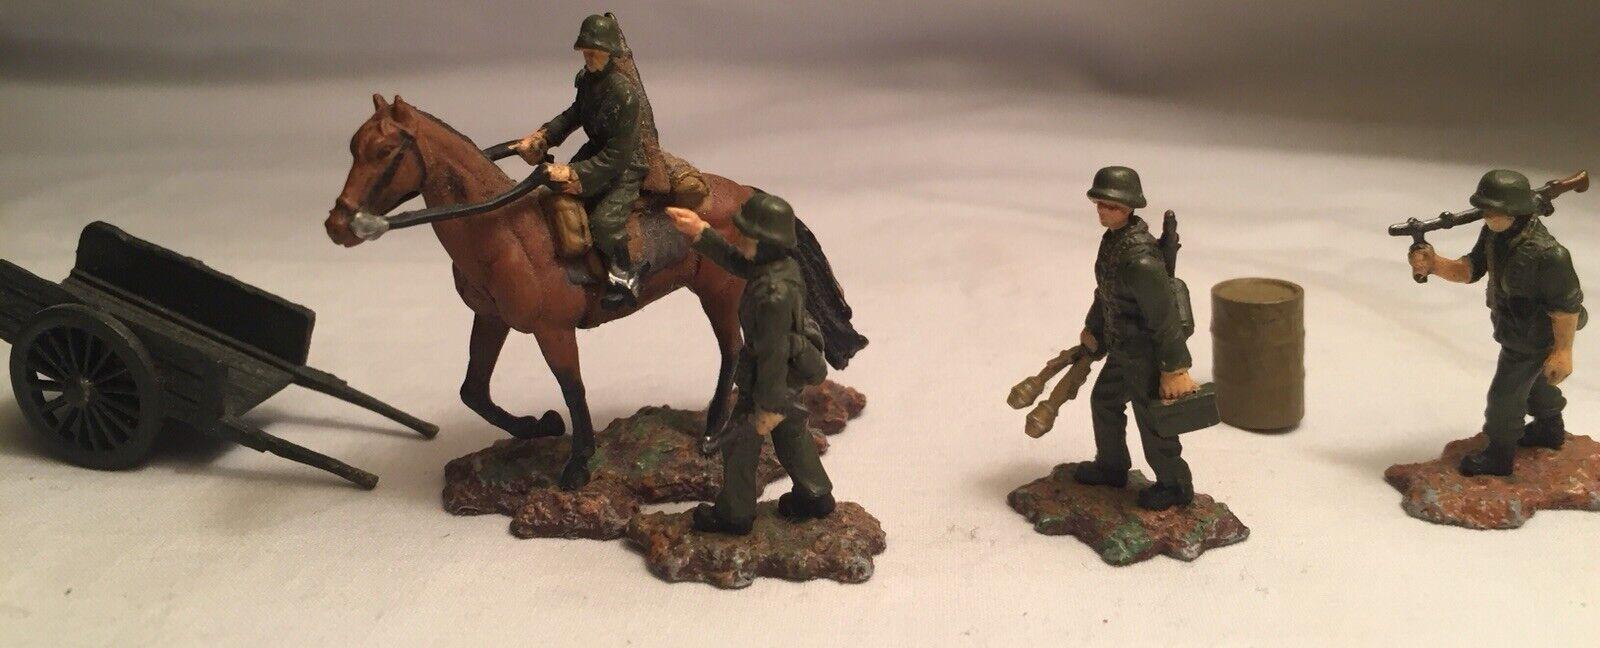 1 87 Scale  Miniature WW2 Geruomo Soldiers Horse Wagon MG42 cifras  per offrirti un piacevole shopping online